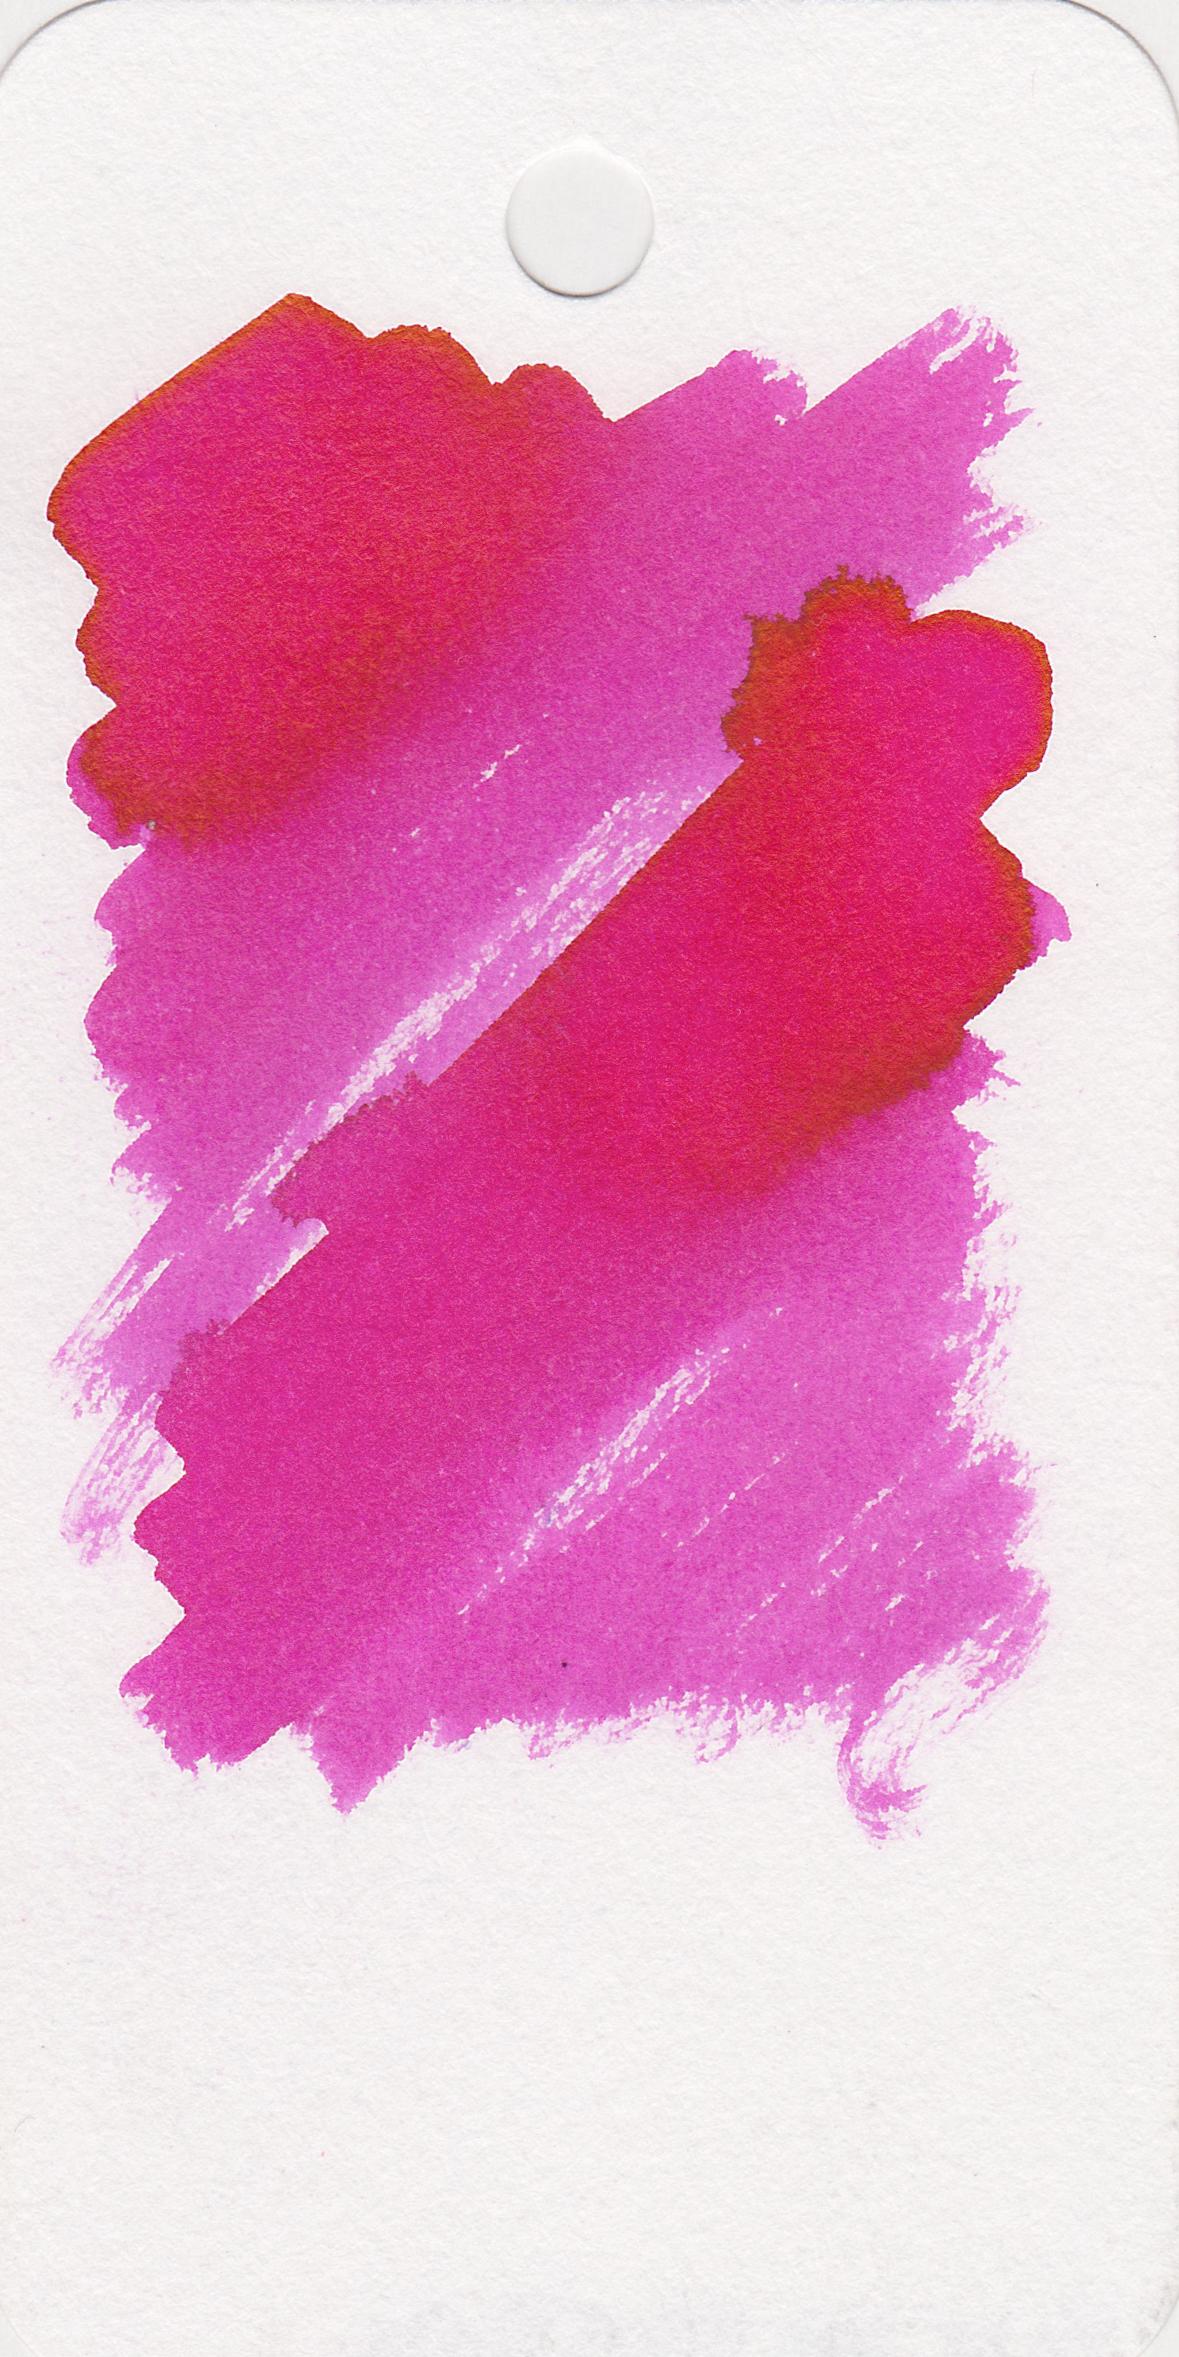 lamy-vibrant-pink-3.jpg